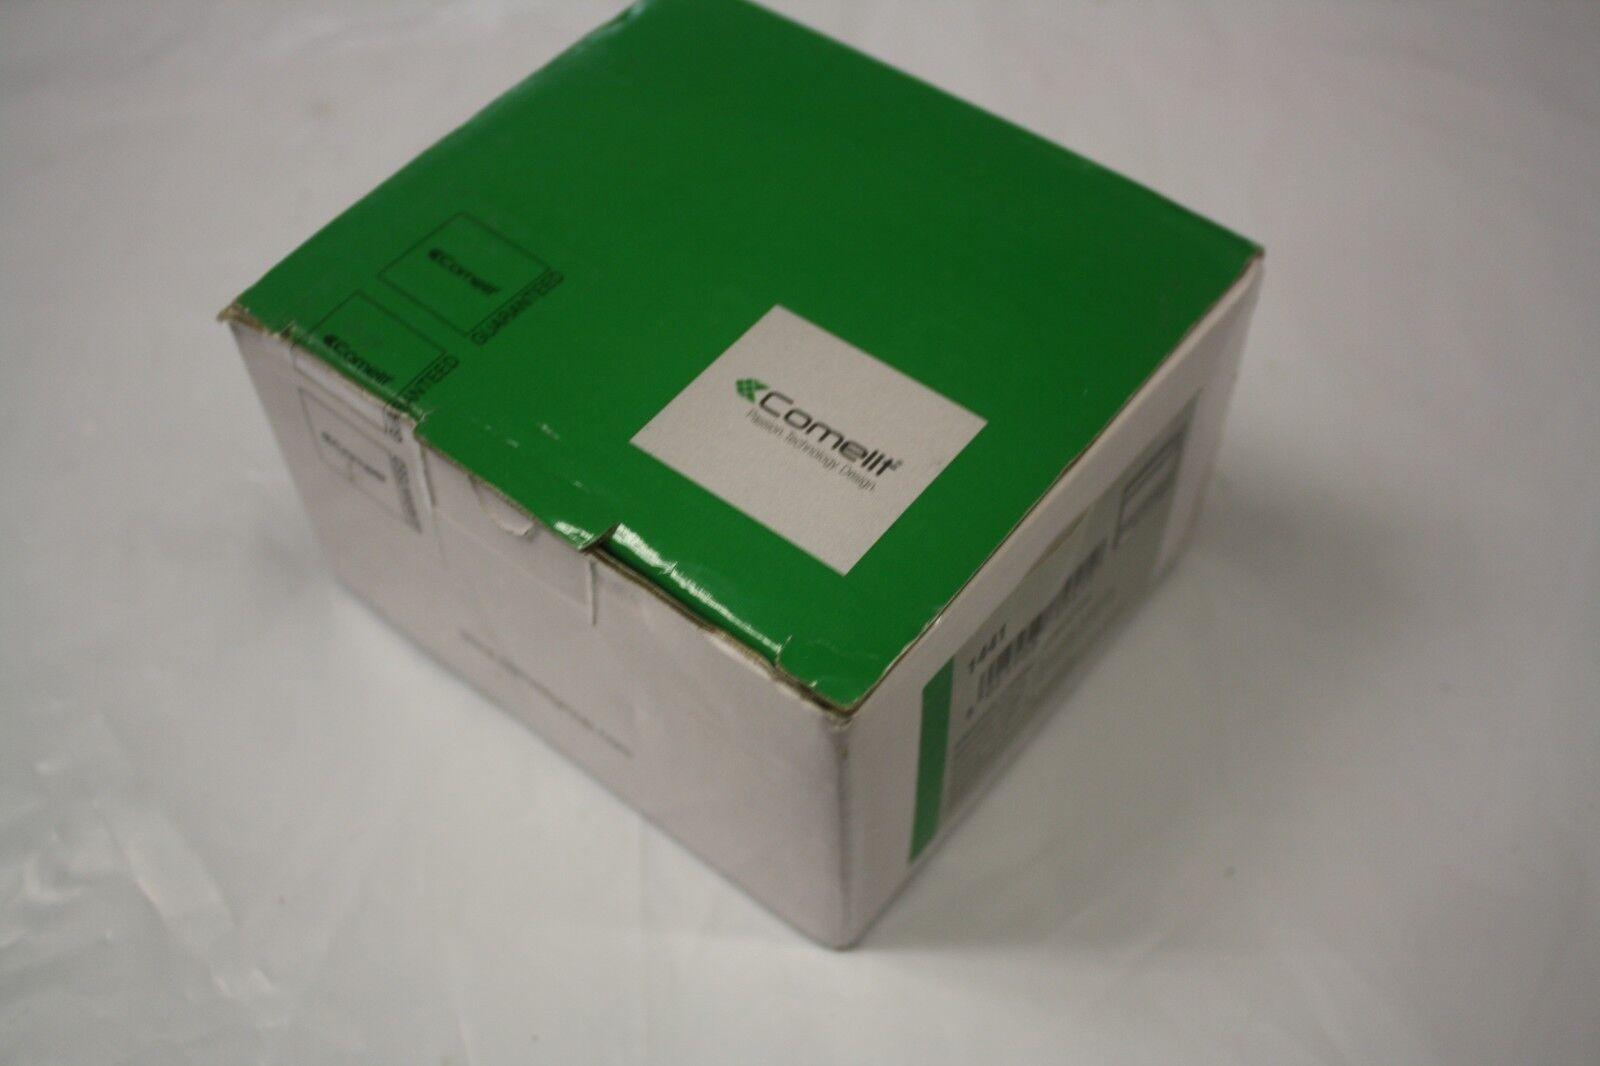 Comelit 1441 VIP System 100W Riser Power Supply Unit